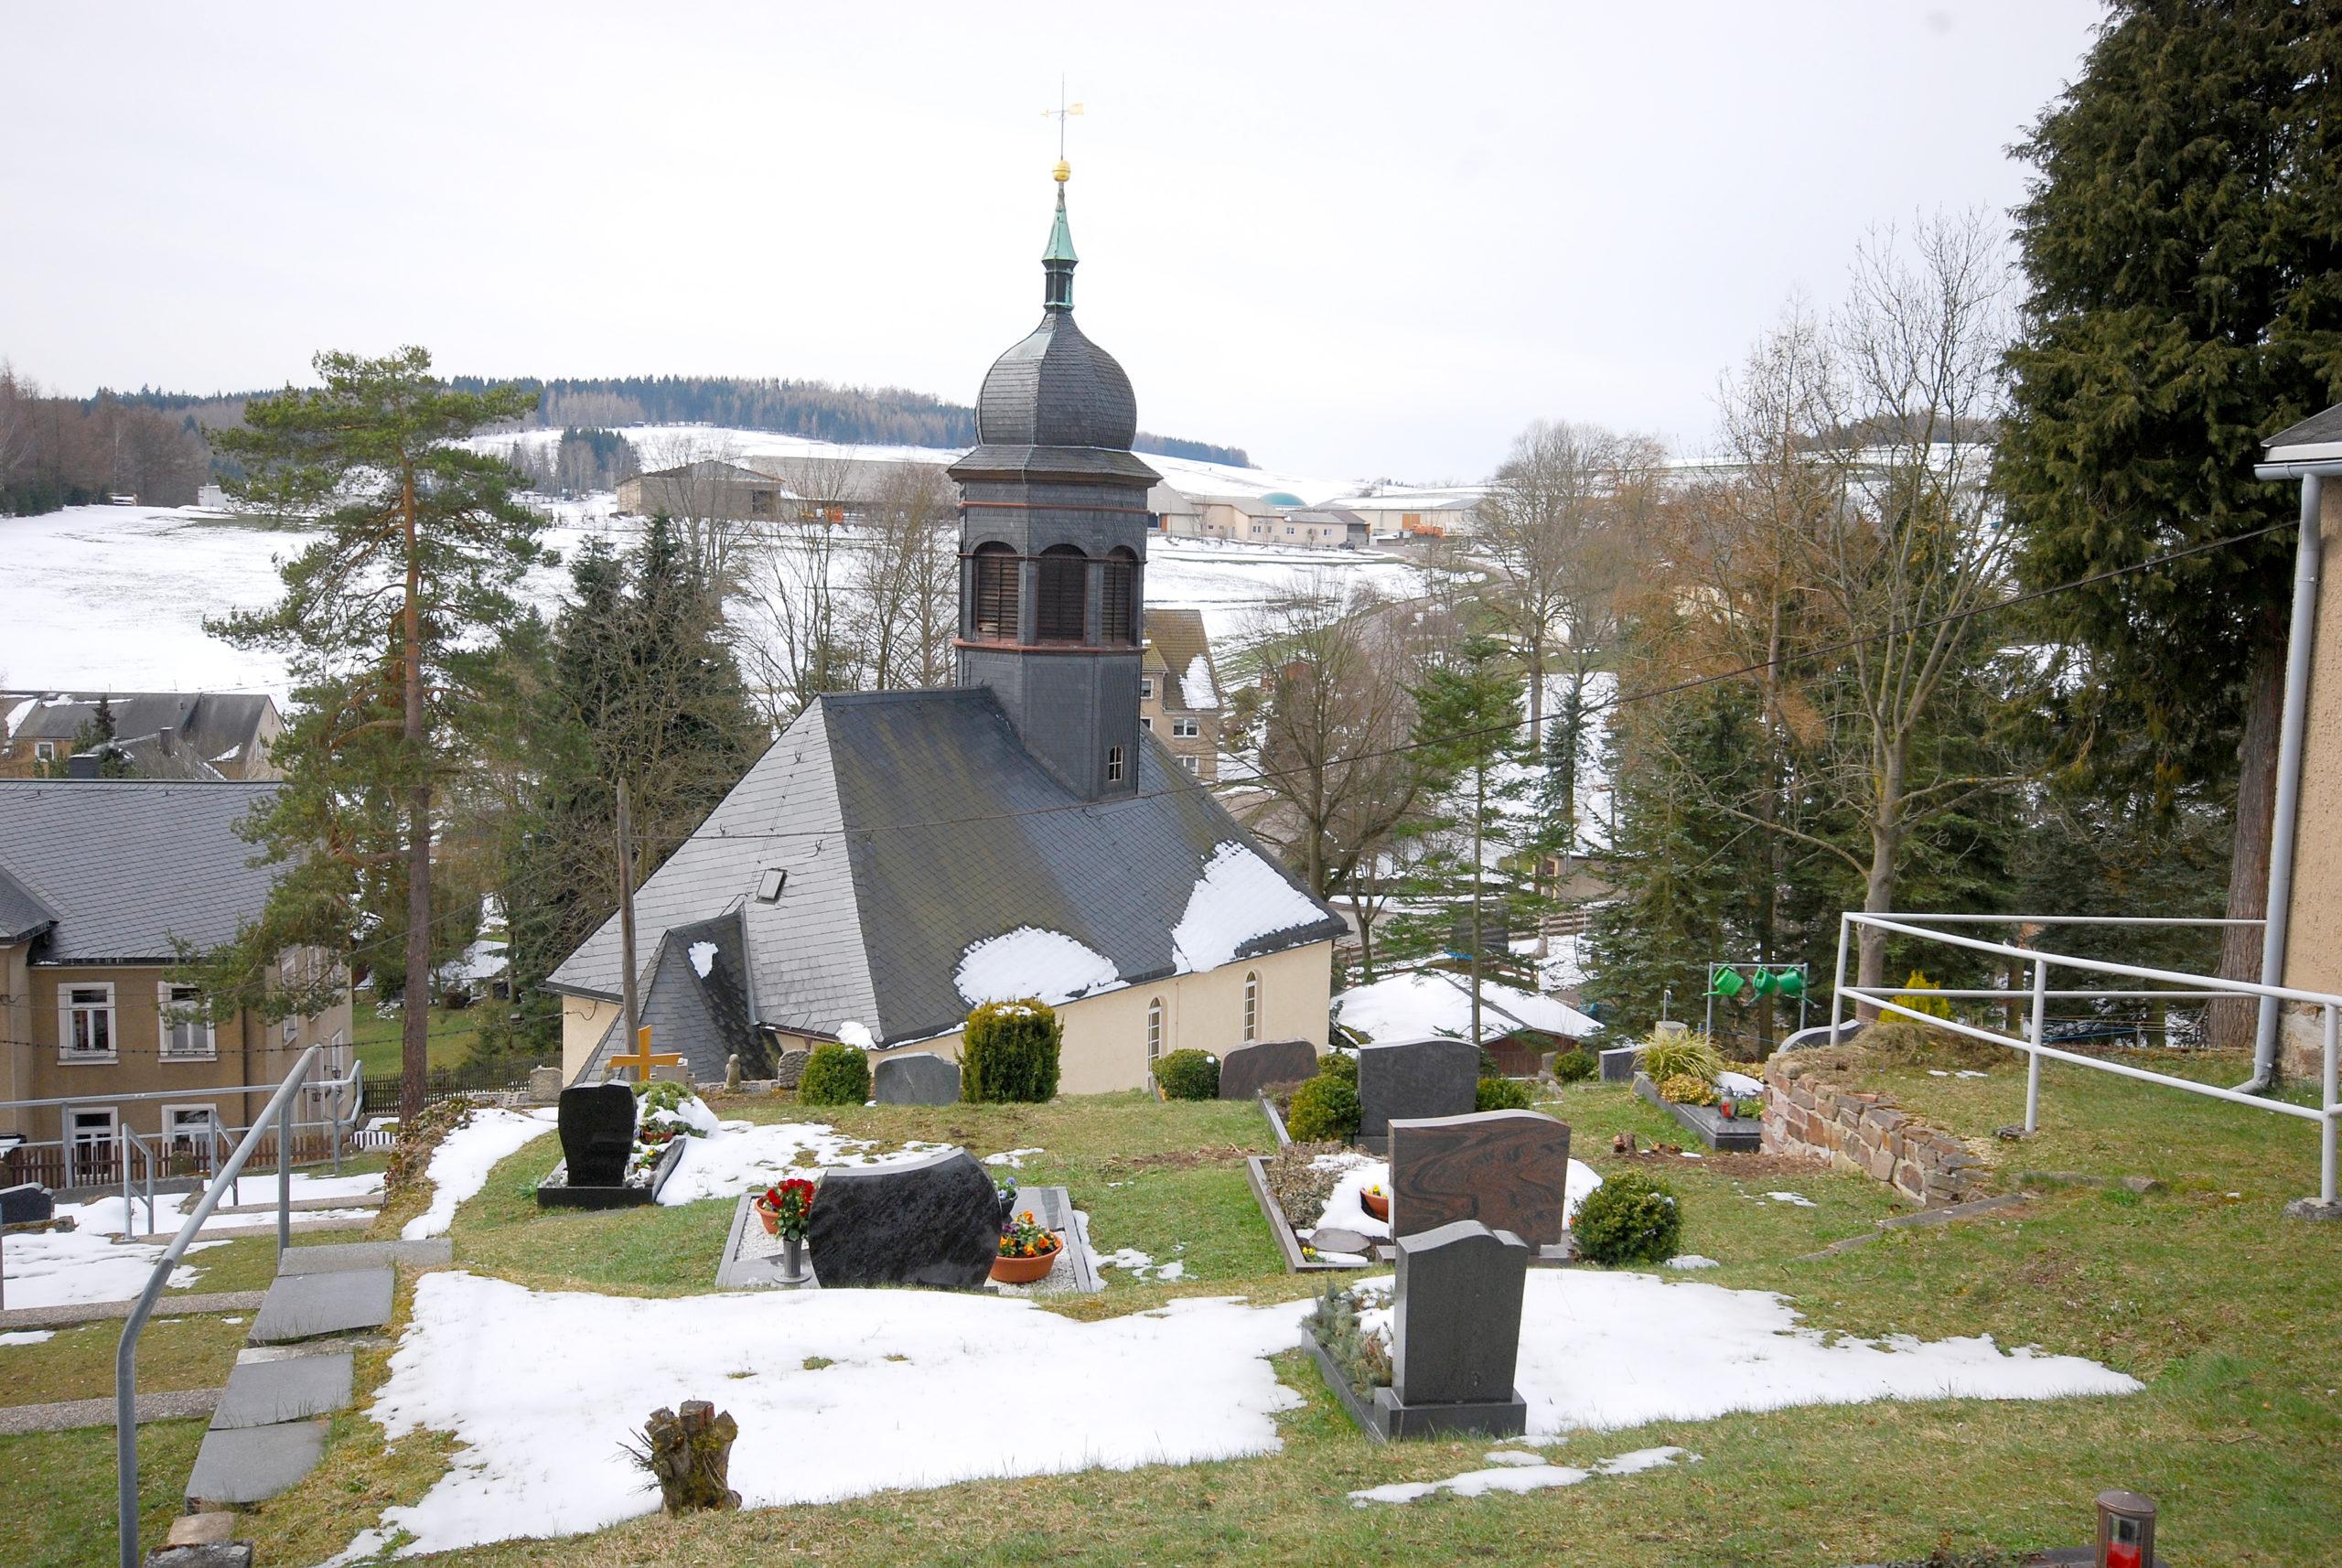 Friedhof Heidersdorf - Blick zur Kirche